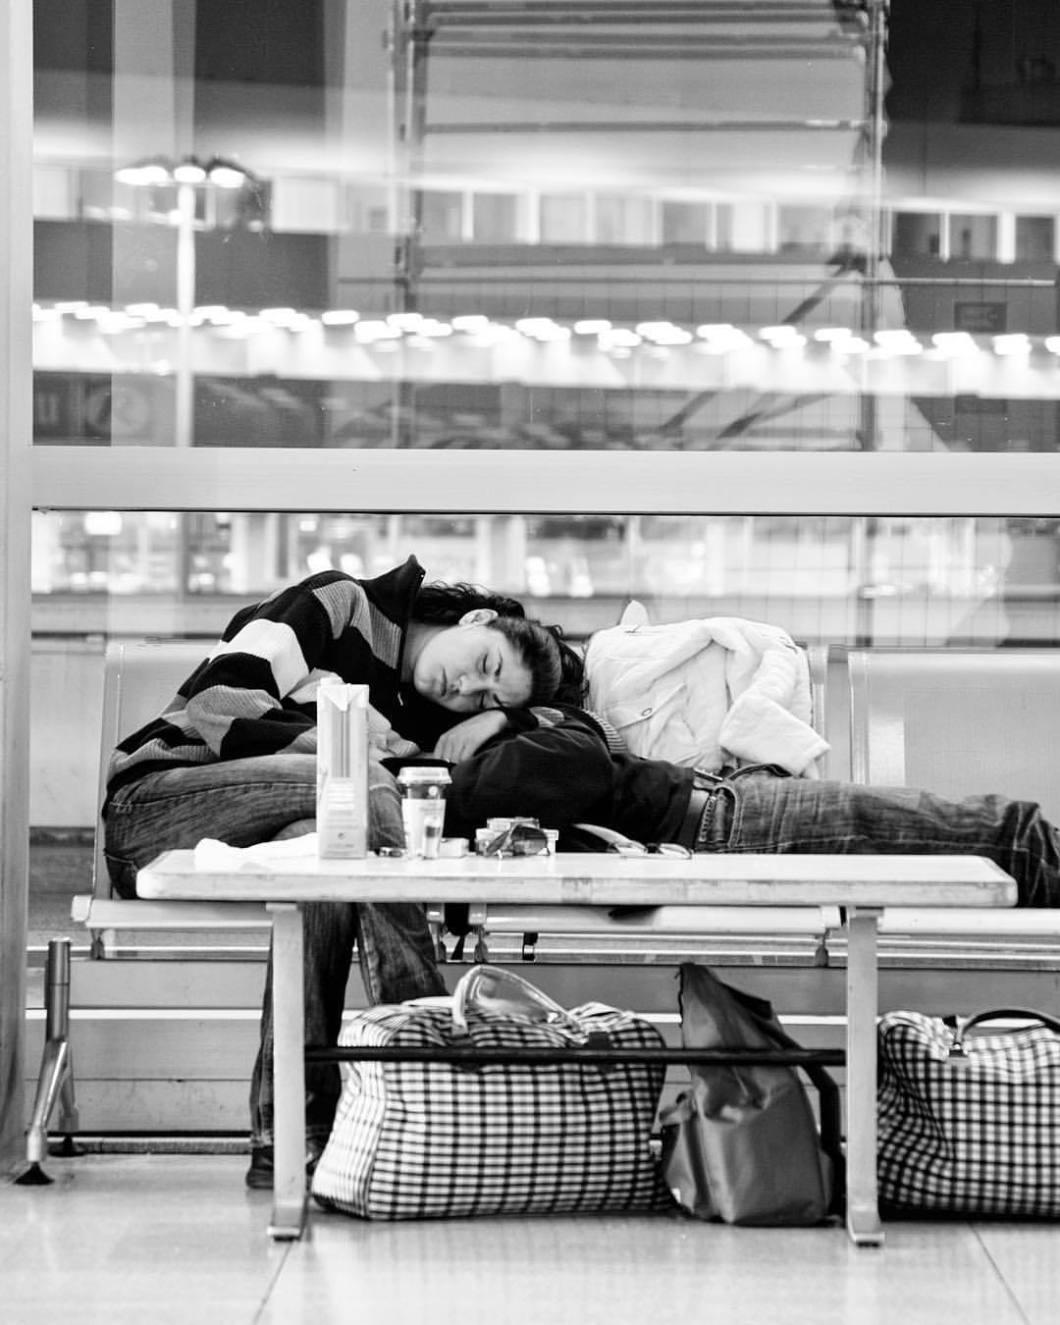 Flughafen Köln/Bonn, 2009.#photooftheday #onephotoaday #photography #bwphotography #blackandwhite #blackandwhitephotography #monochrome #streetphotography #streetart #reportage #city #buildings #airport #cologne #cgn #cologneairport #people #peoplephotography #sleeping #waiting #reportagephotography #reportage #social #socialphotography # (hier: Köln Bonn Airport)